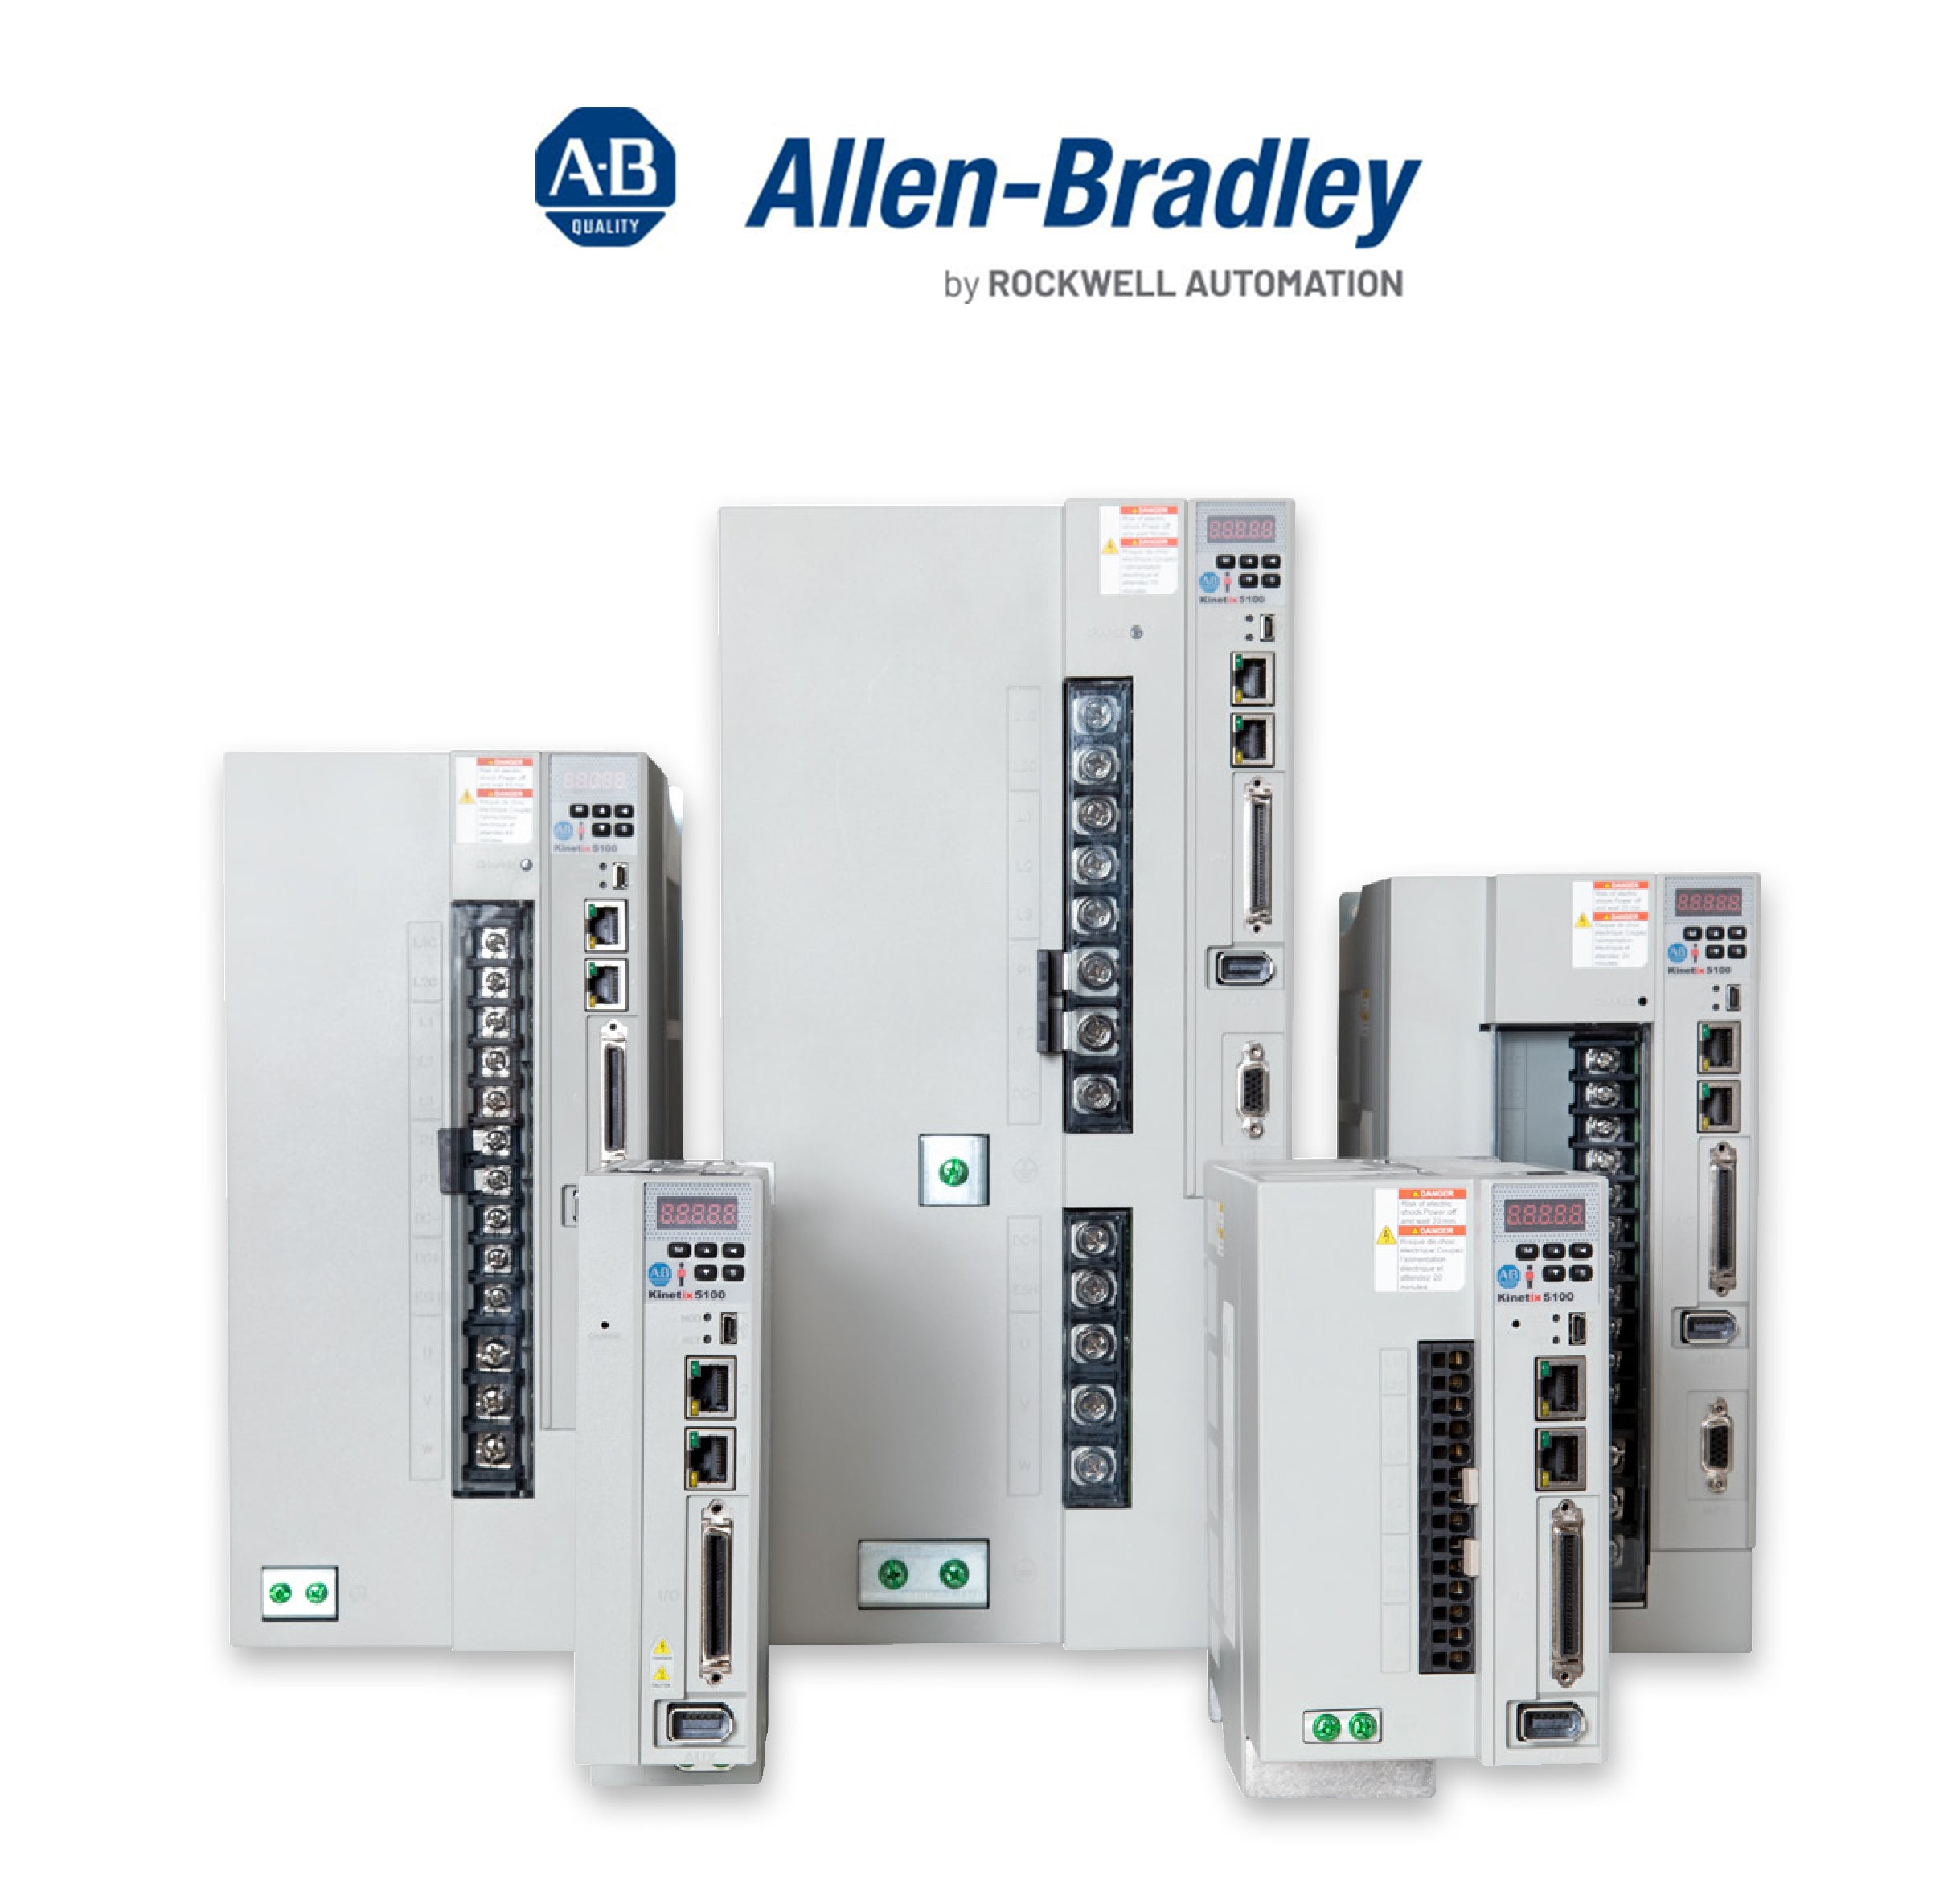 Allen-Bradley Kinetix 5100